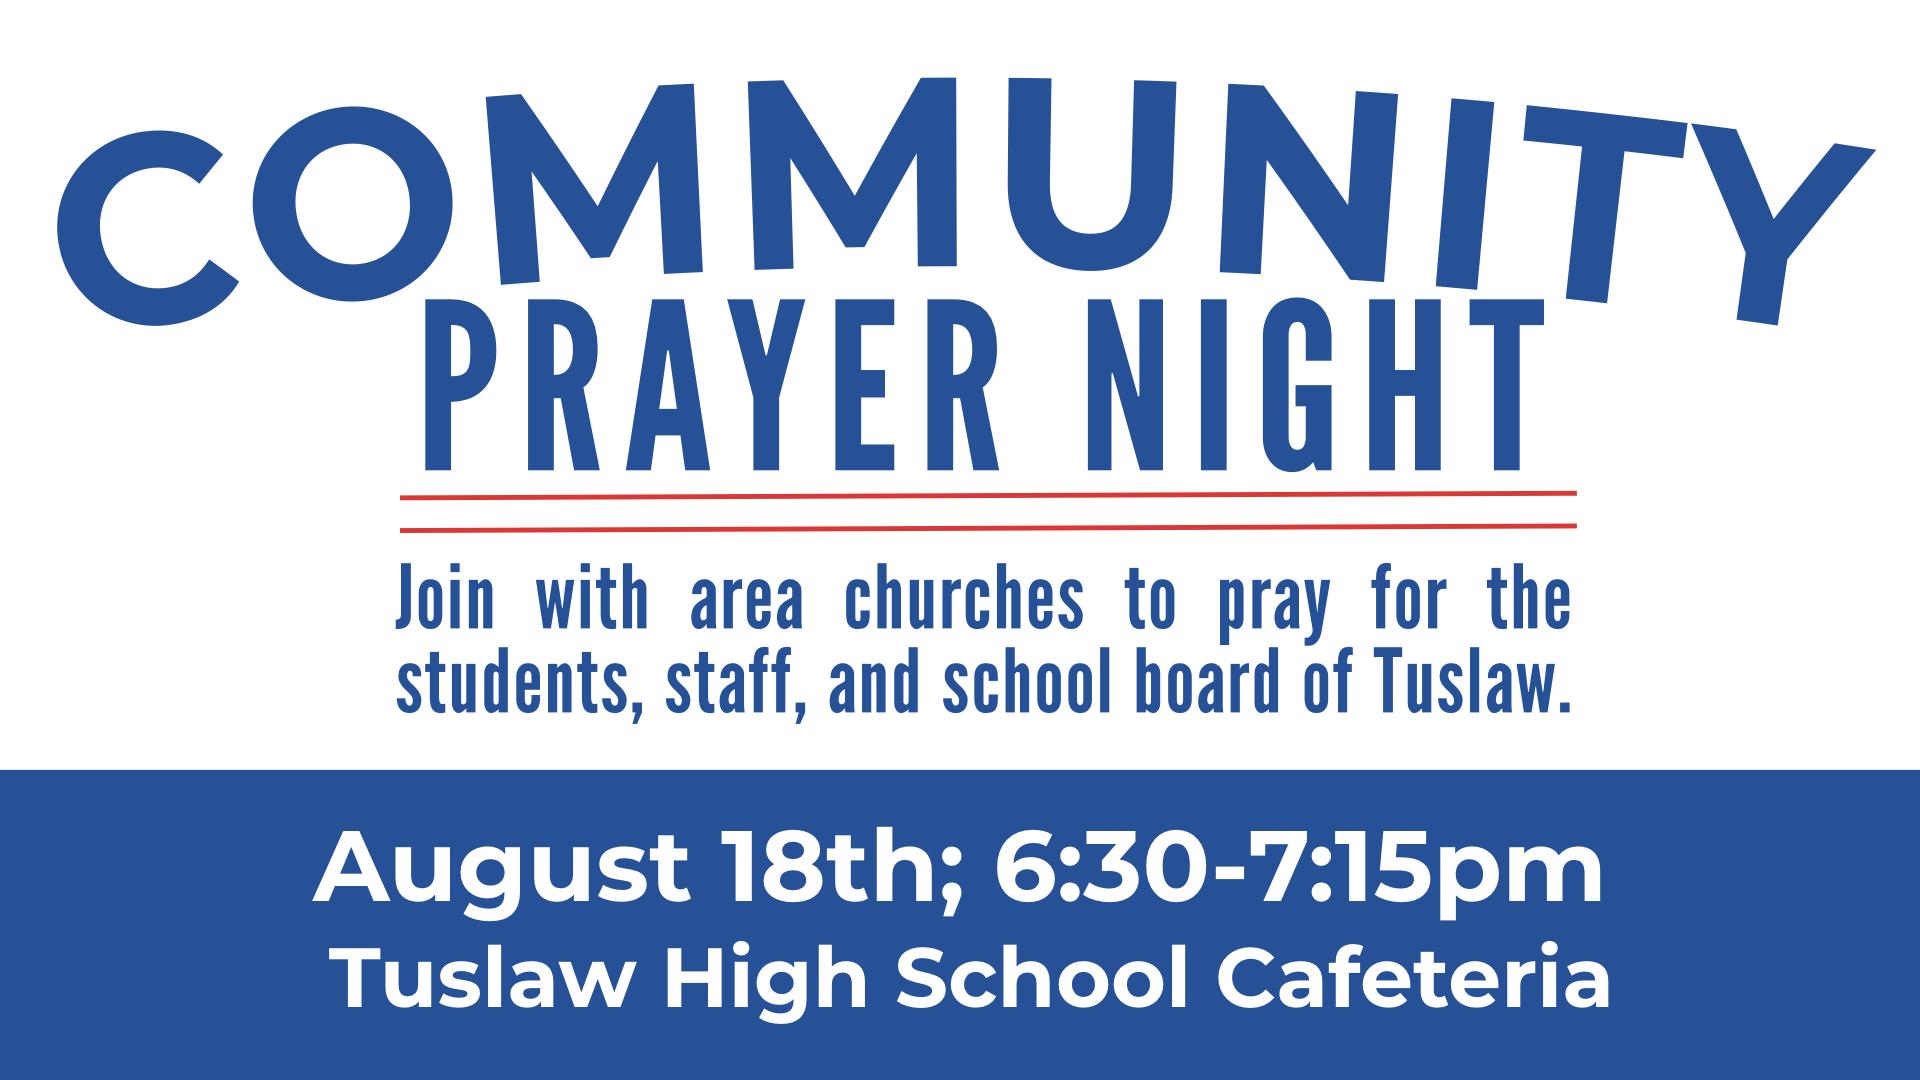 community prayer night slide.001.jpeg